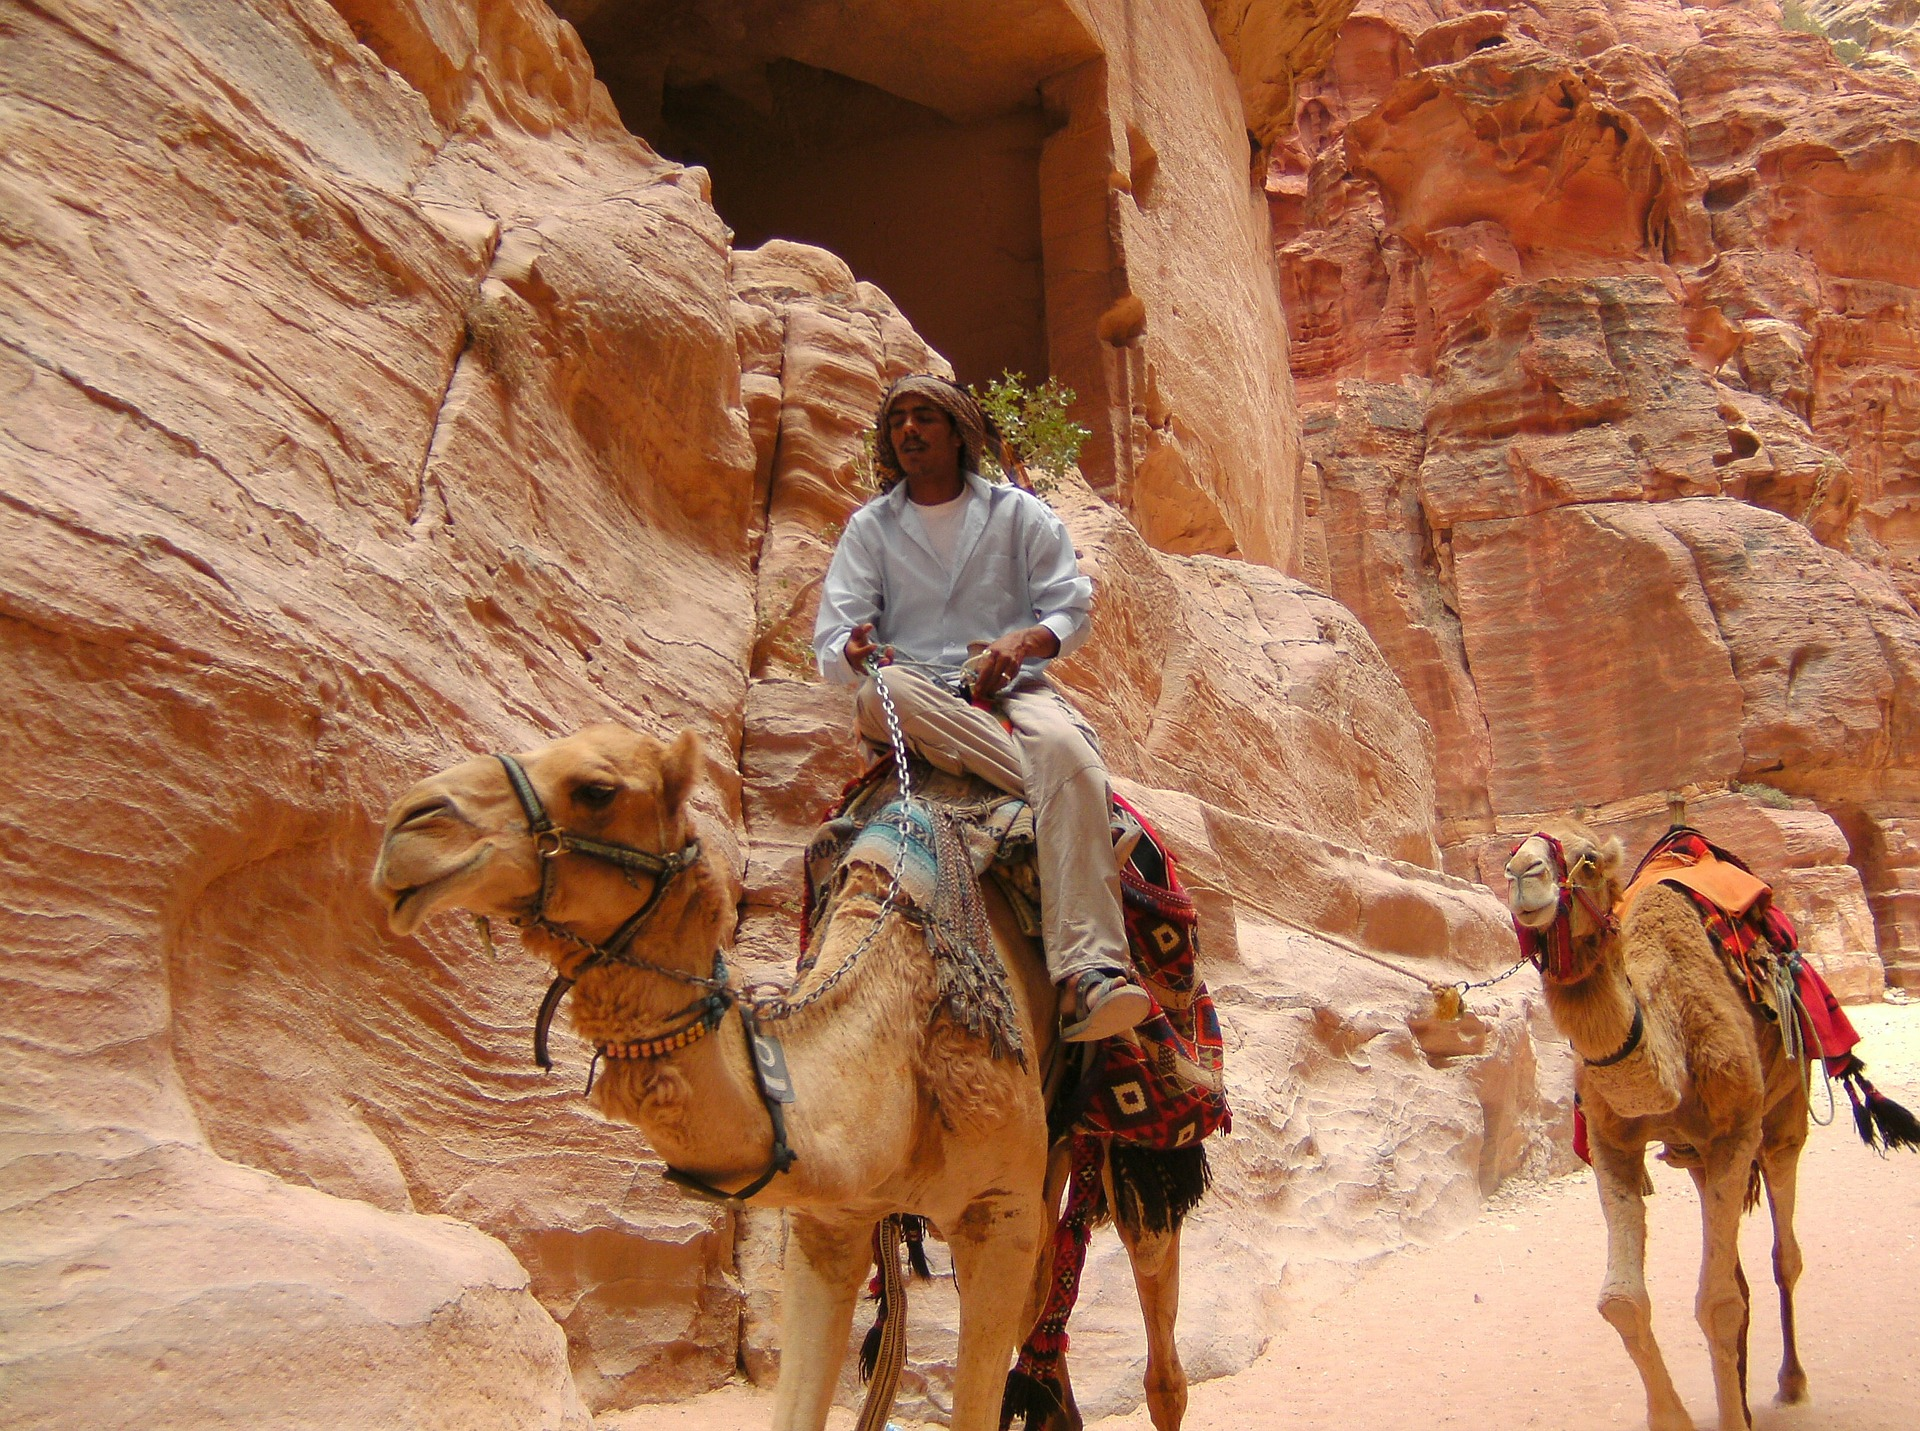 Essential Petra - Camel ride through Petra, Jordan